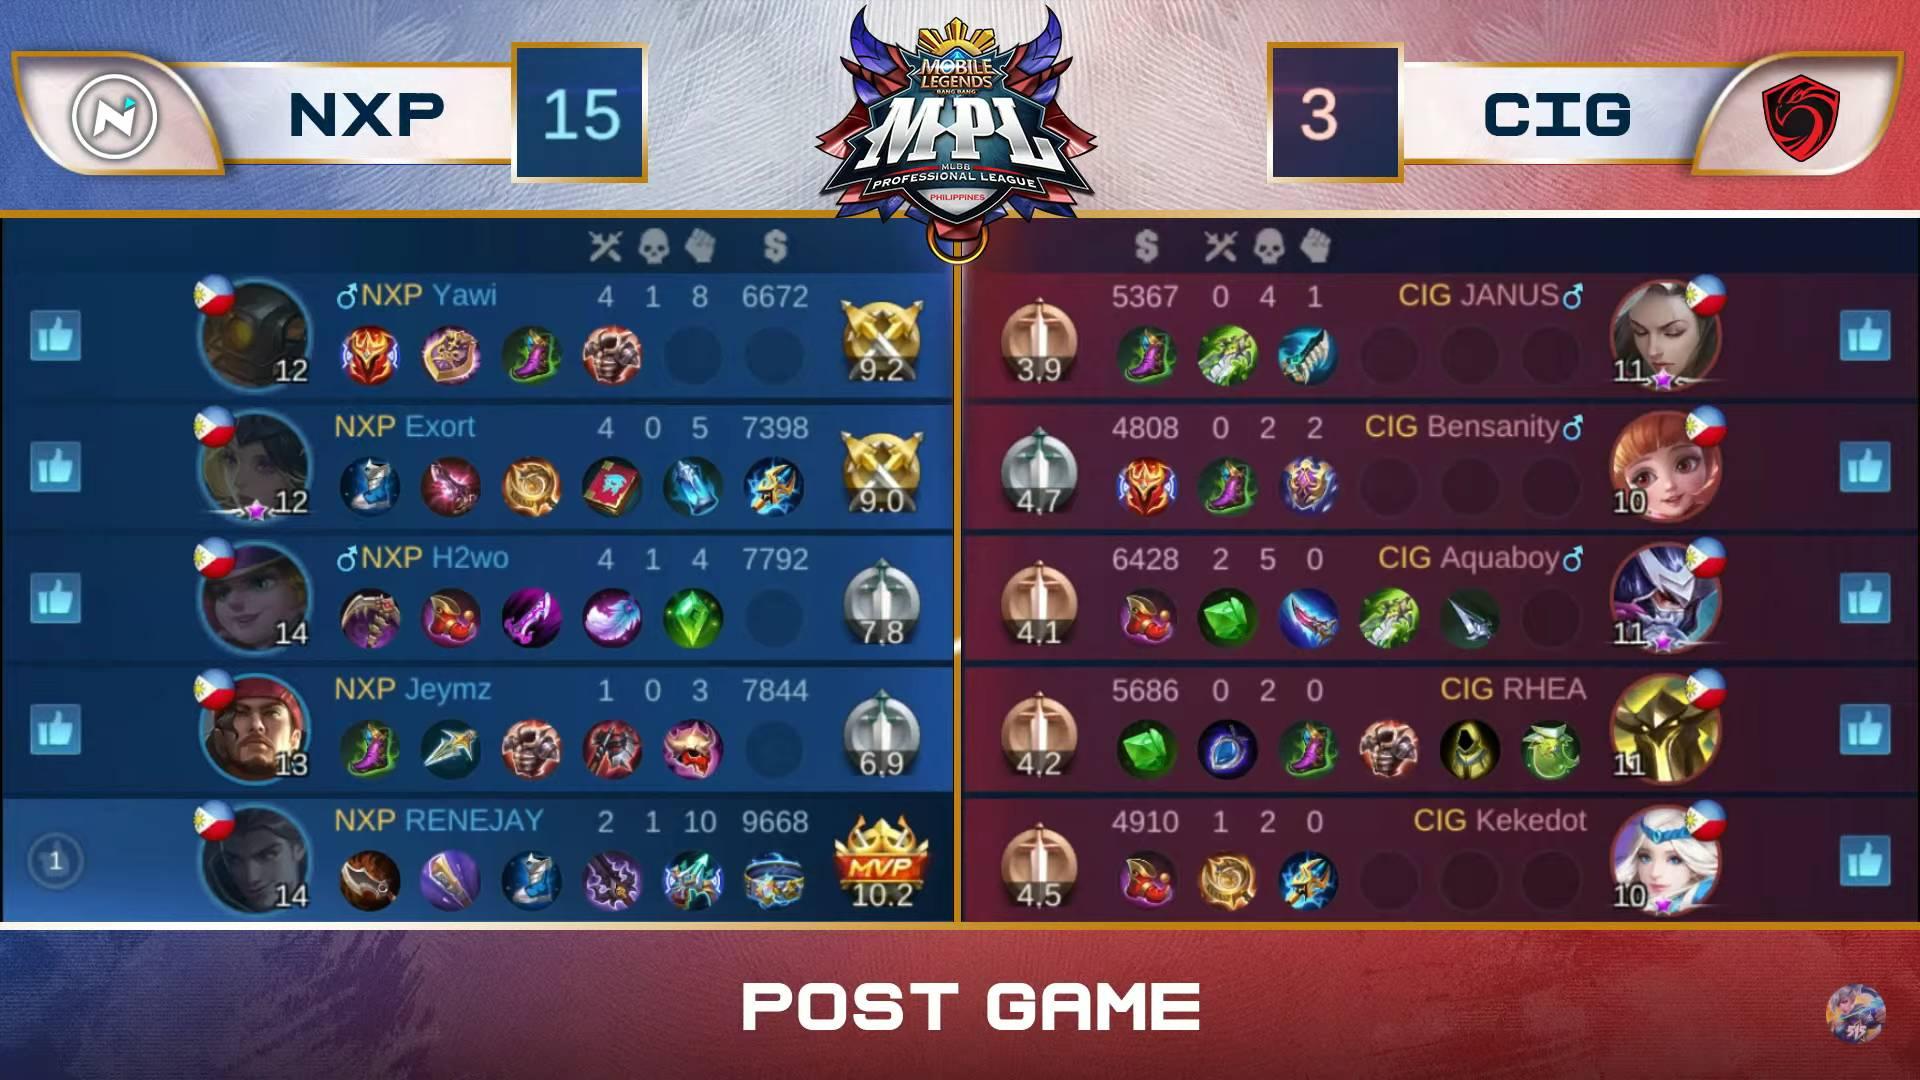 MPL-PH-Season-7-NXP-def-Cignal-Game-1 Nexplay arrests four-game slide, keeps Cignal grasping in MPL-PH ESports Mobile Legends MPL-PH News  - philippine sports news